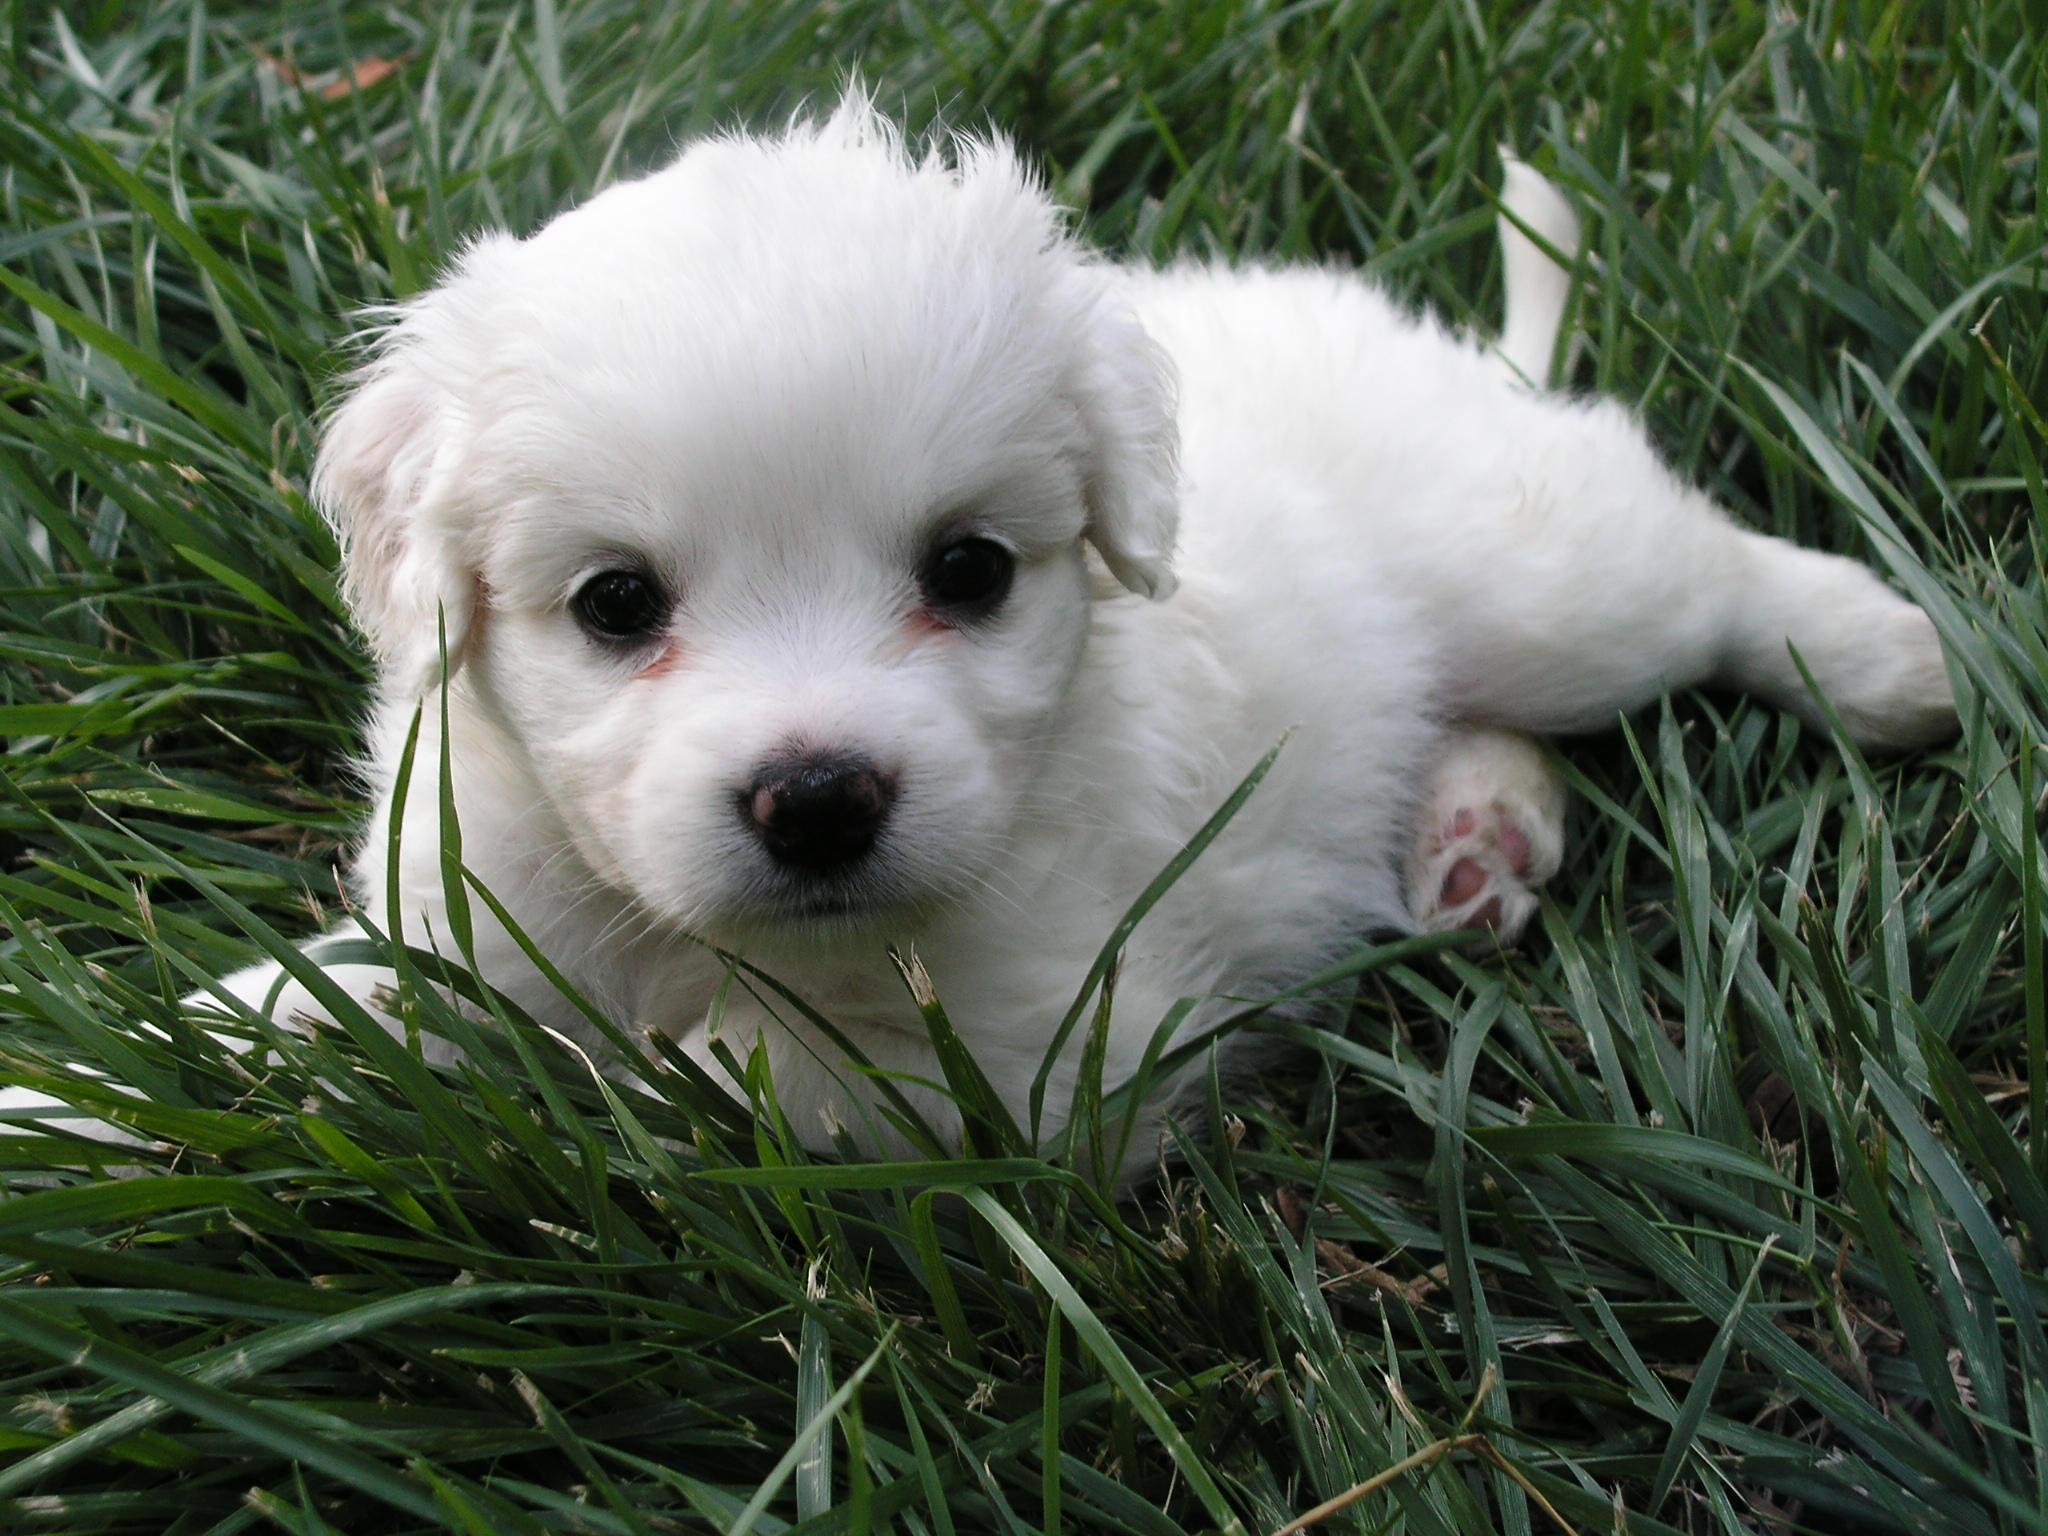 Los perritos mas lindos - Taringa!